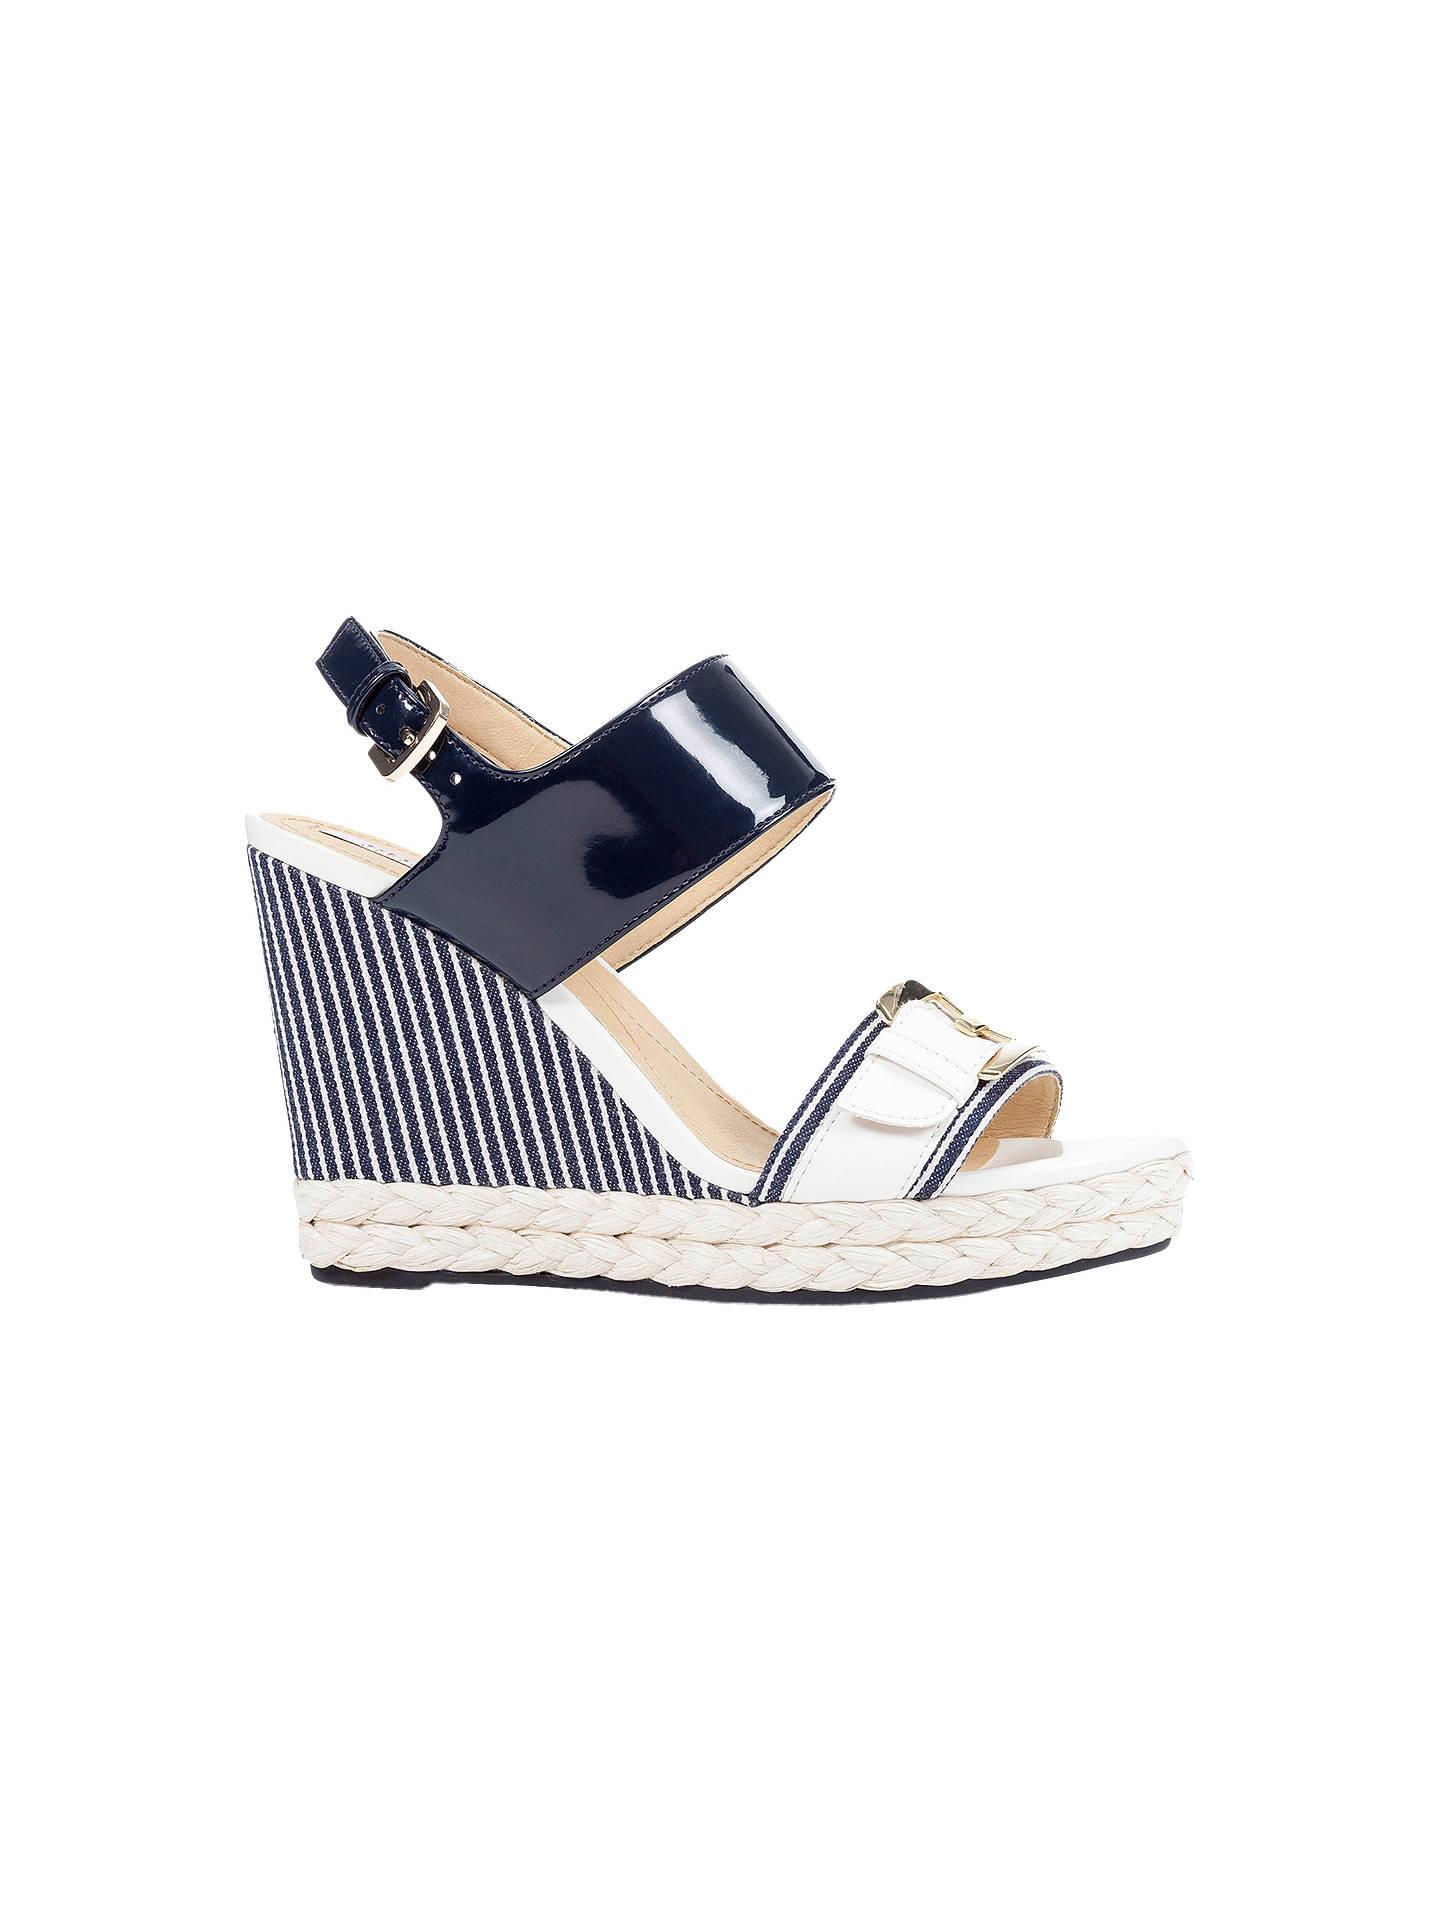 7c62ead9444 Buy Geox Women's Janira Wedge Heeled Sandals, Denim Blue, 3 Online at  johnlewis.